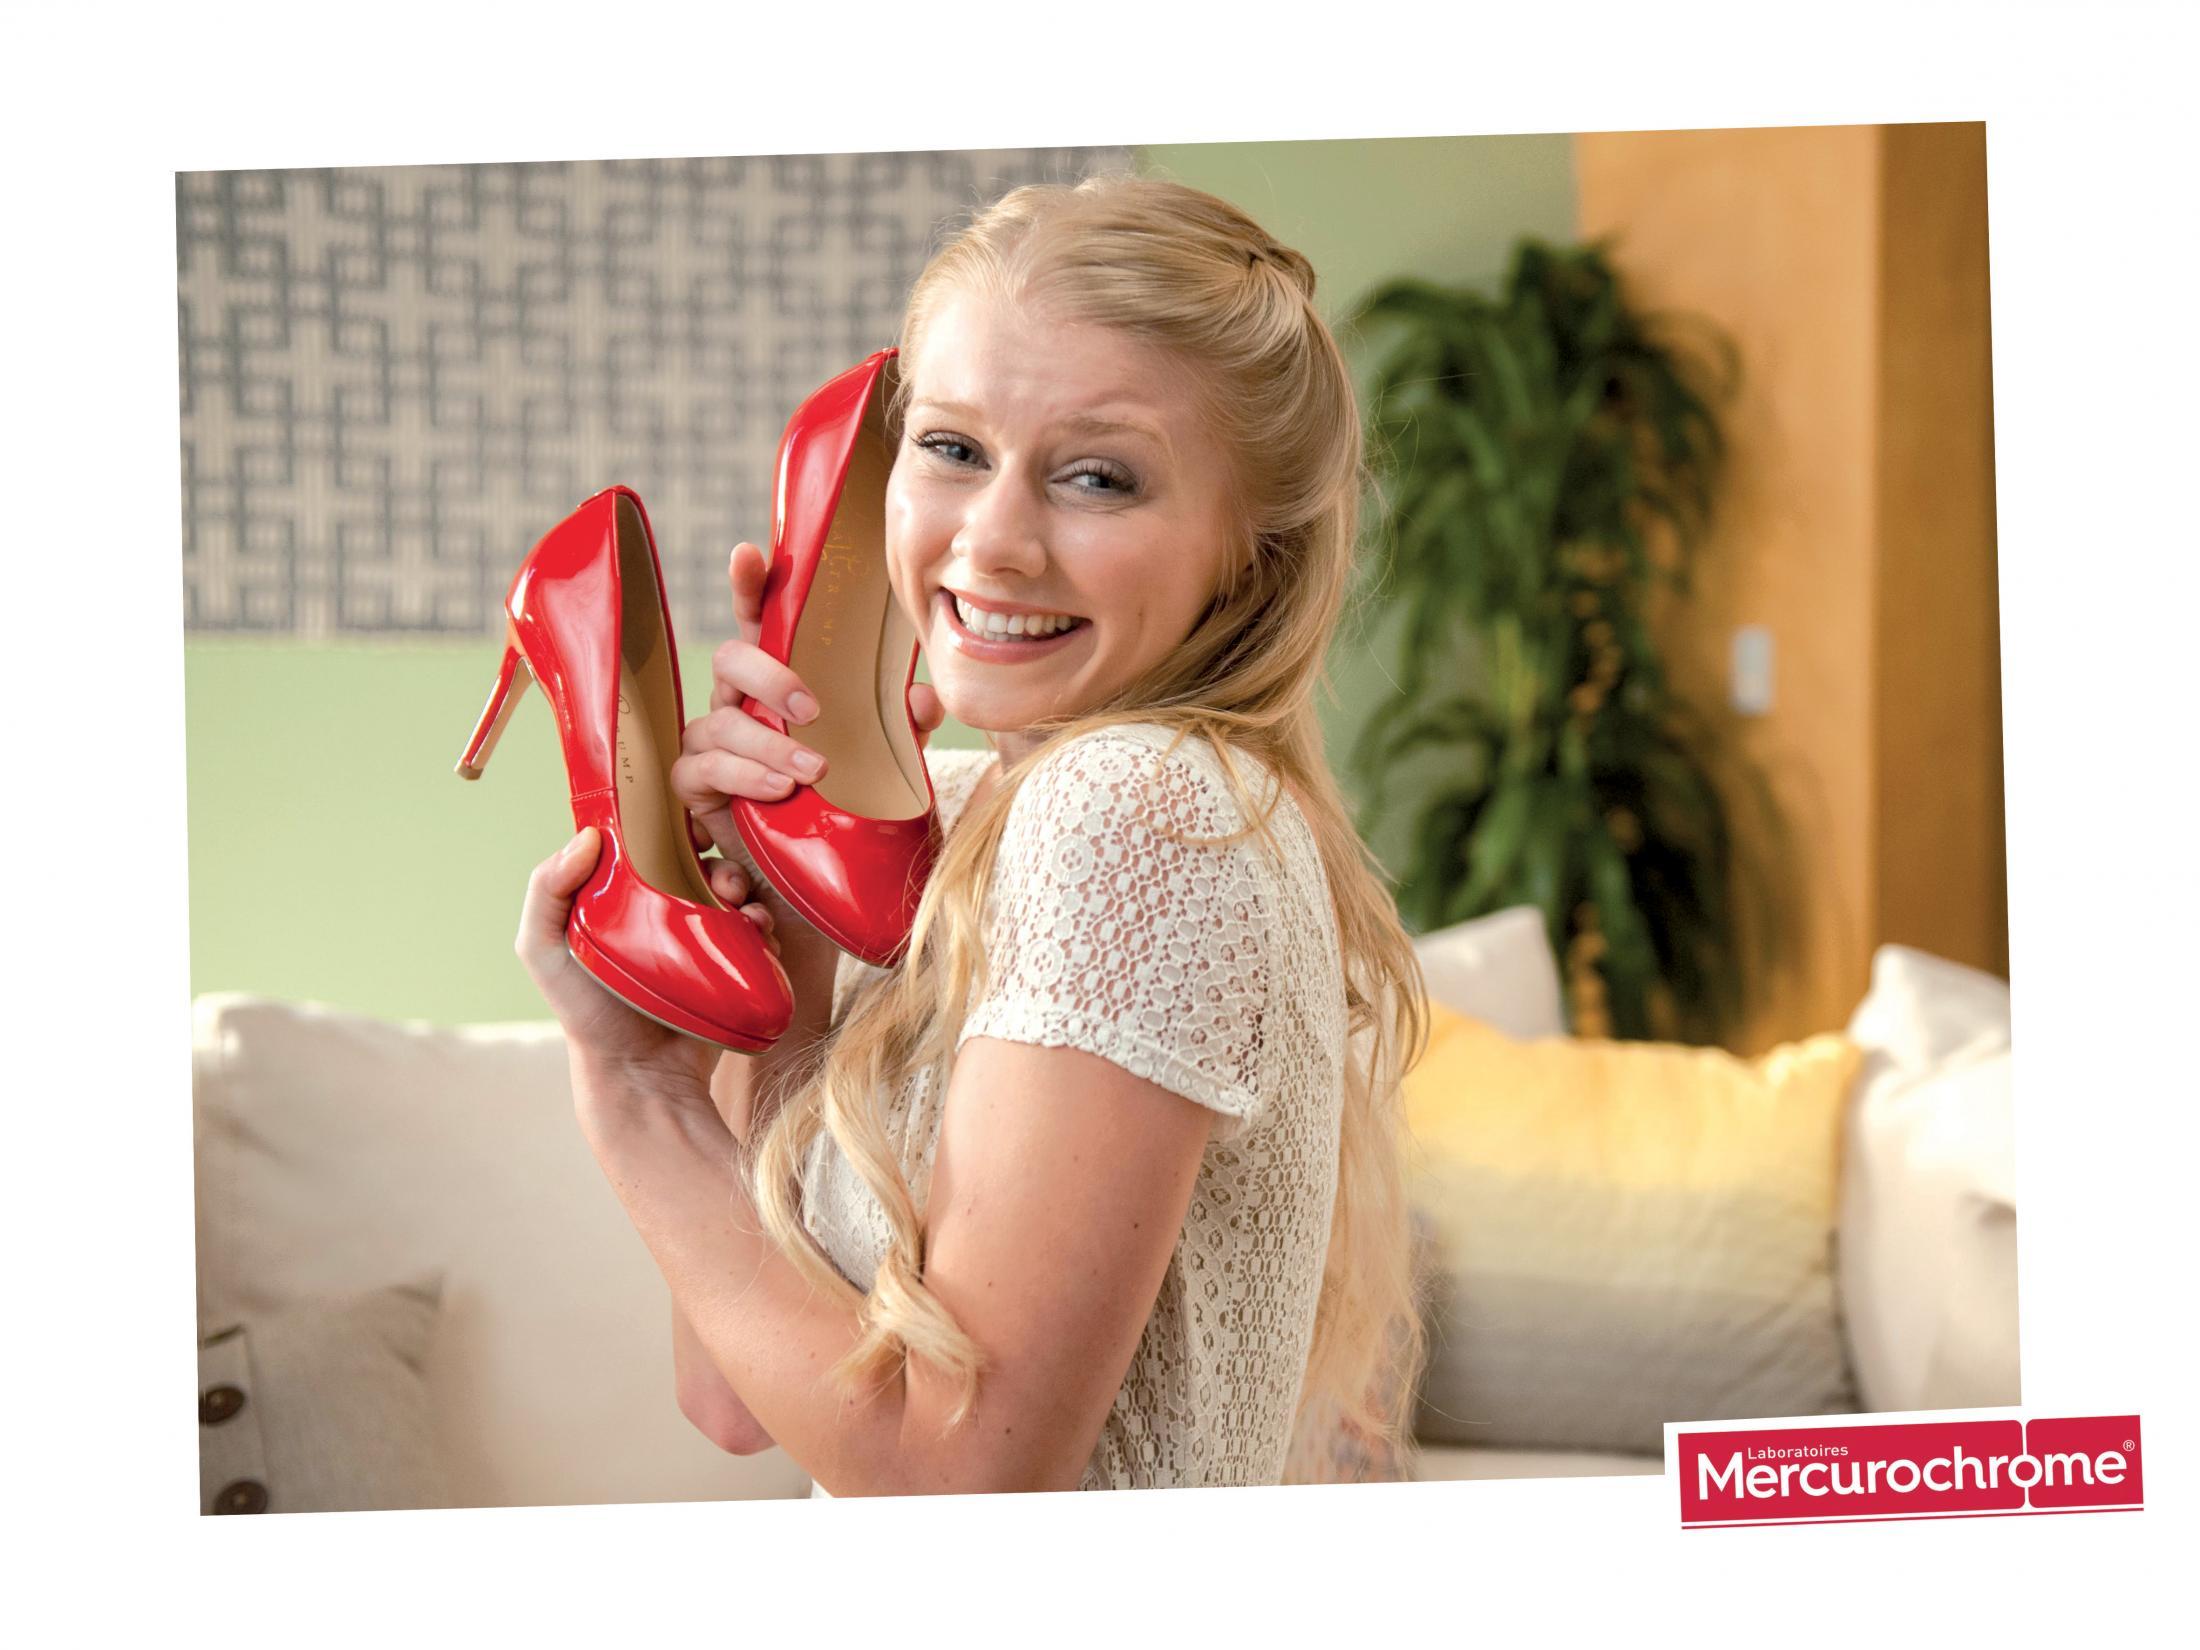 Thumbnail for Mercurochrome - Shoes